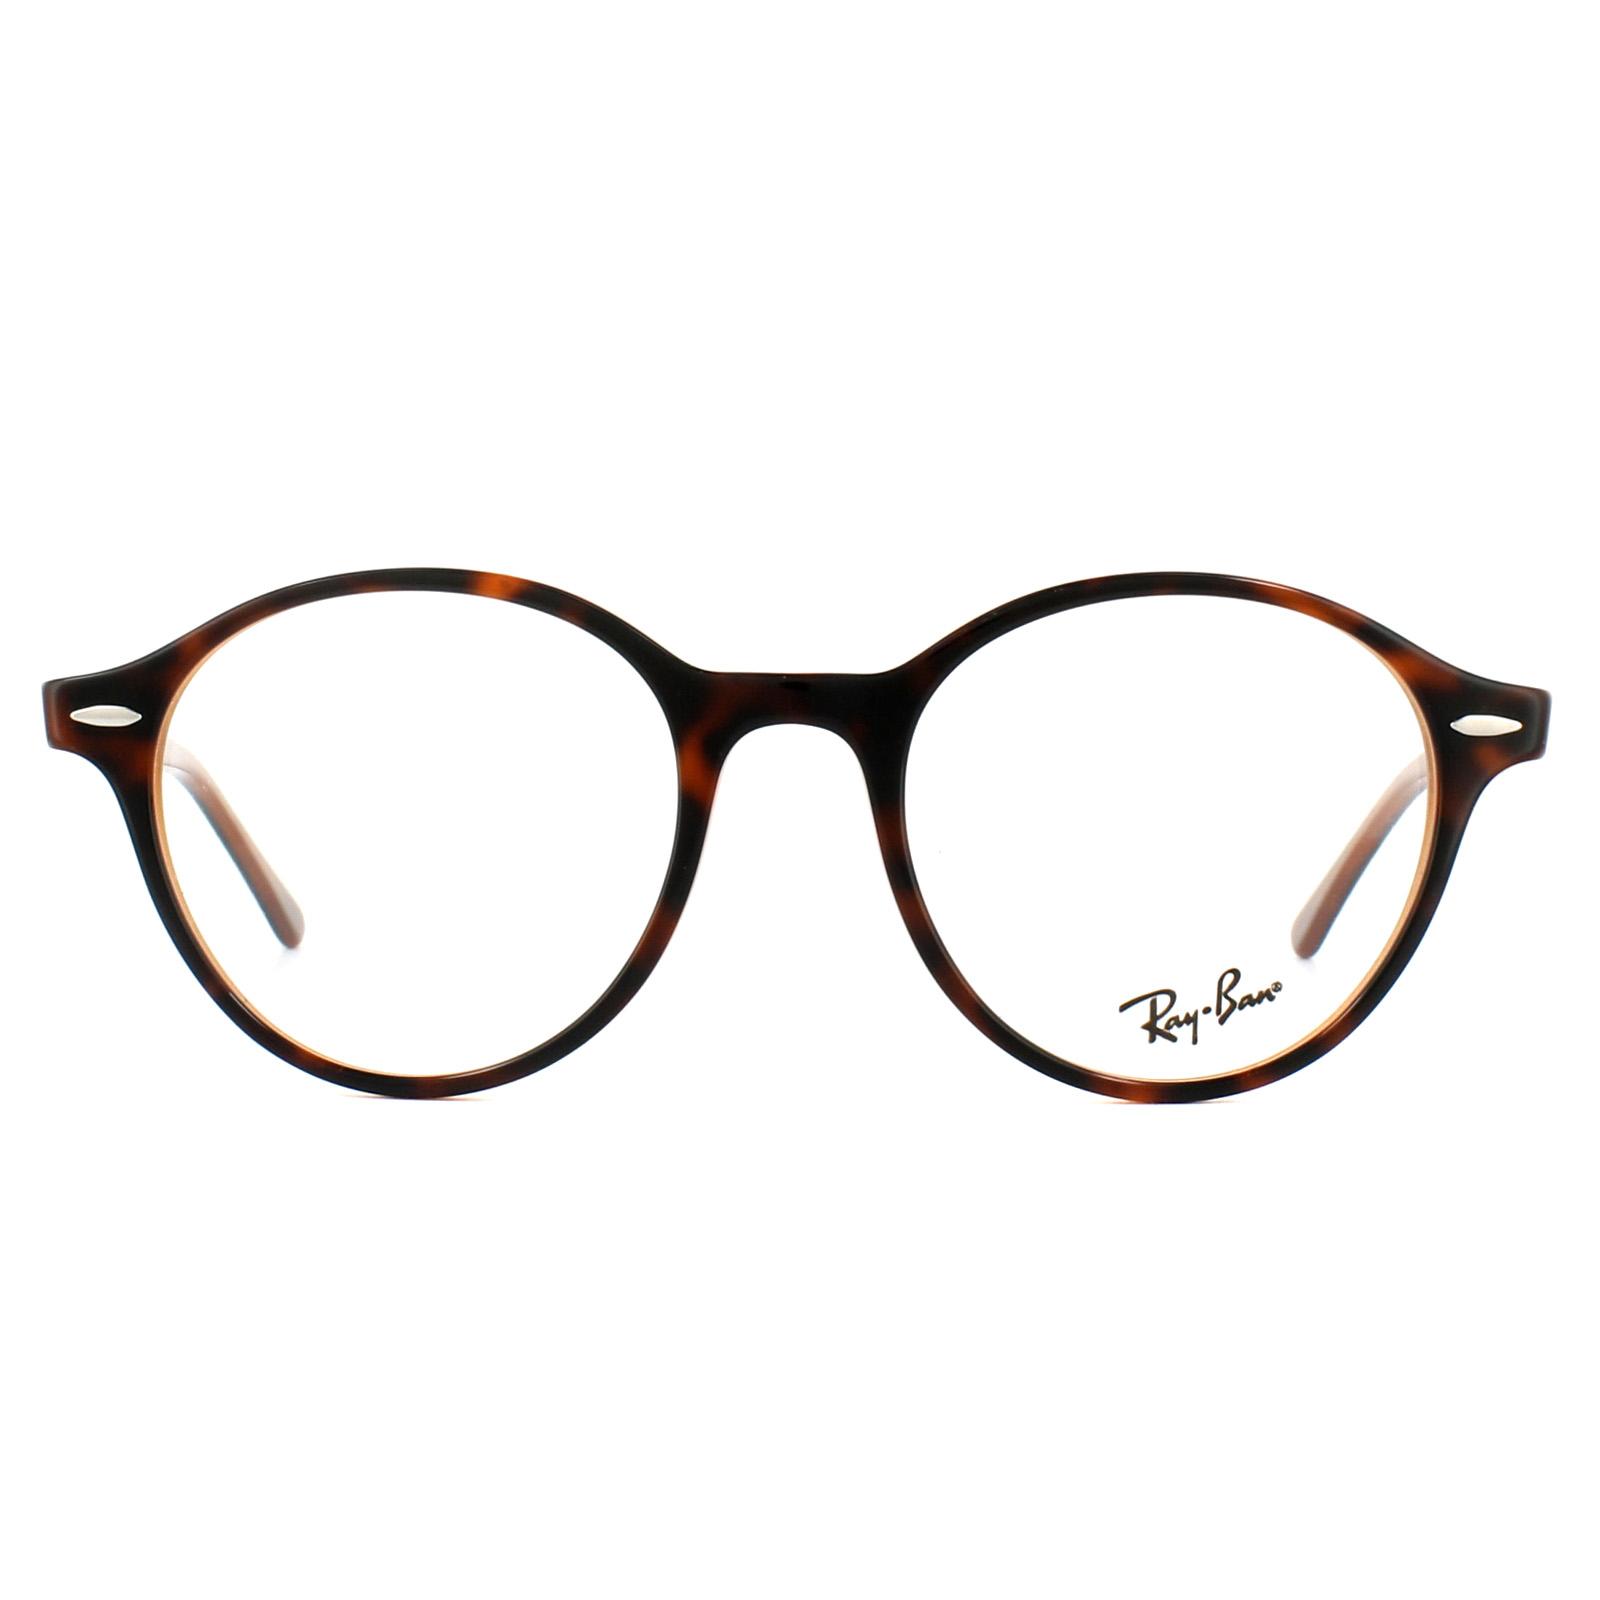 d7de44b757 Sentinel Ray-Ban Glasses Frames 7118 Dean 5713 Top Havana on Light Brown  50mm Mens Womens